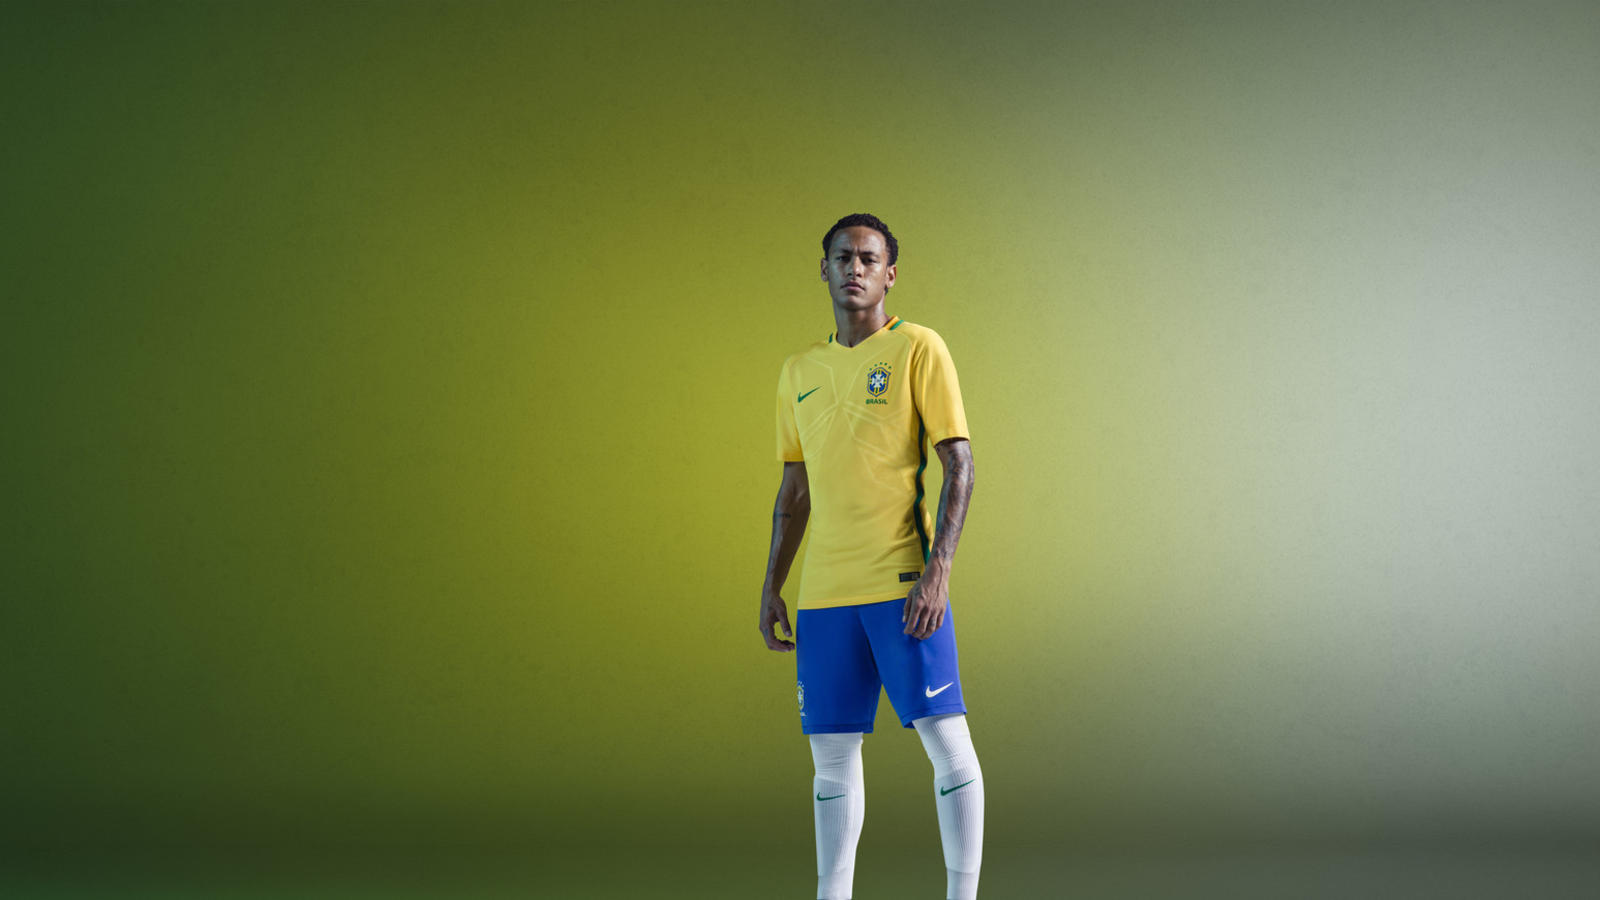 separation shoes 51f53 e8e90 Brasil 2016 National Football Kits - Nike News